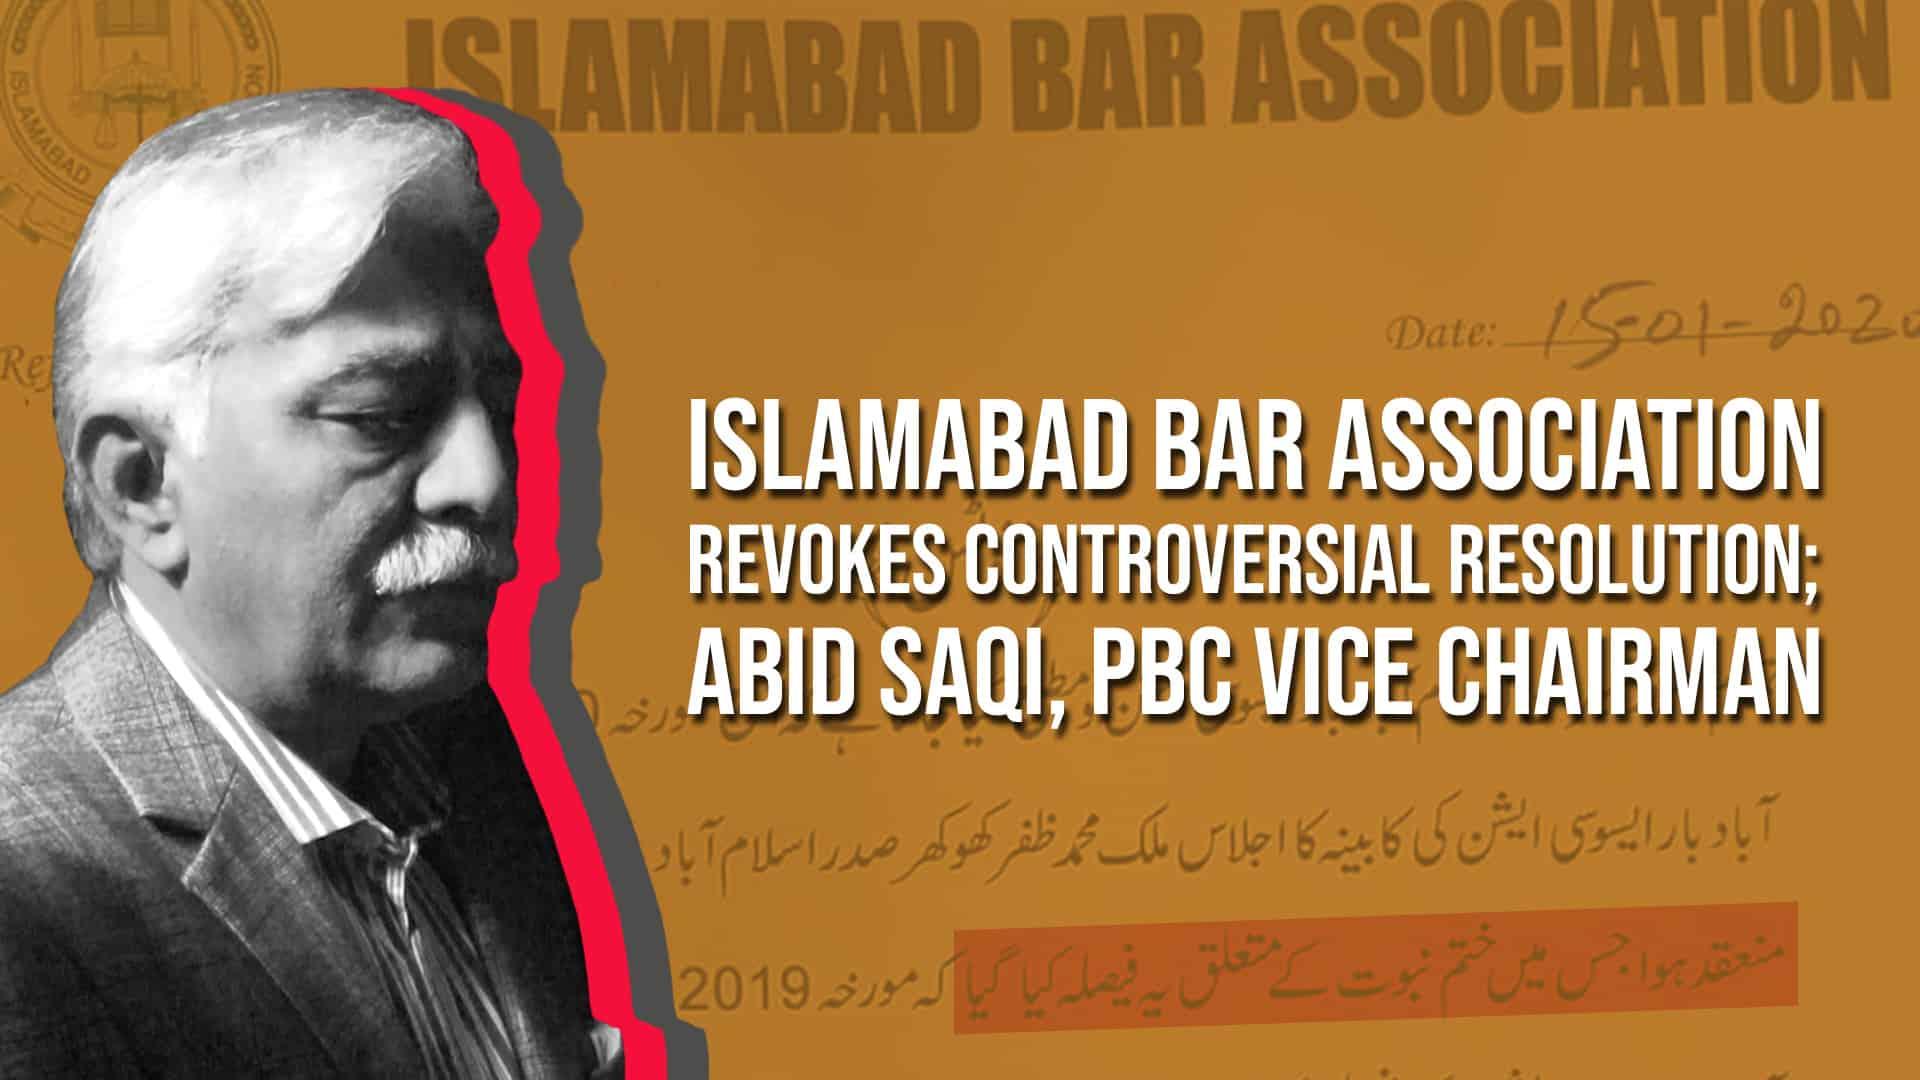 Islamabad Bar Association Revokes Controversial Resolution; Abid Saqi, PBC Vice Chairman